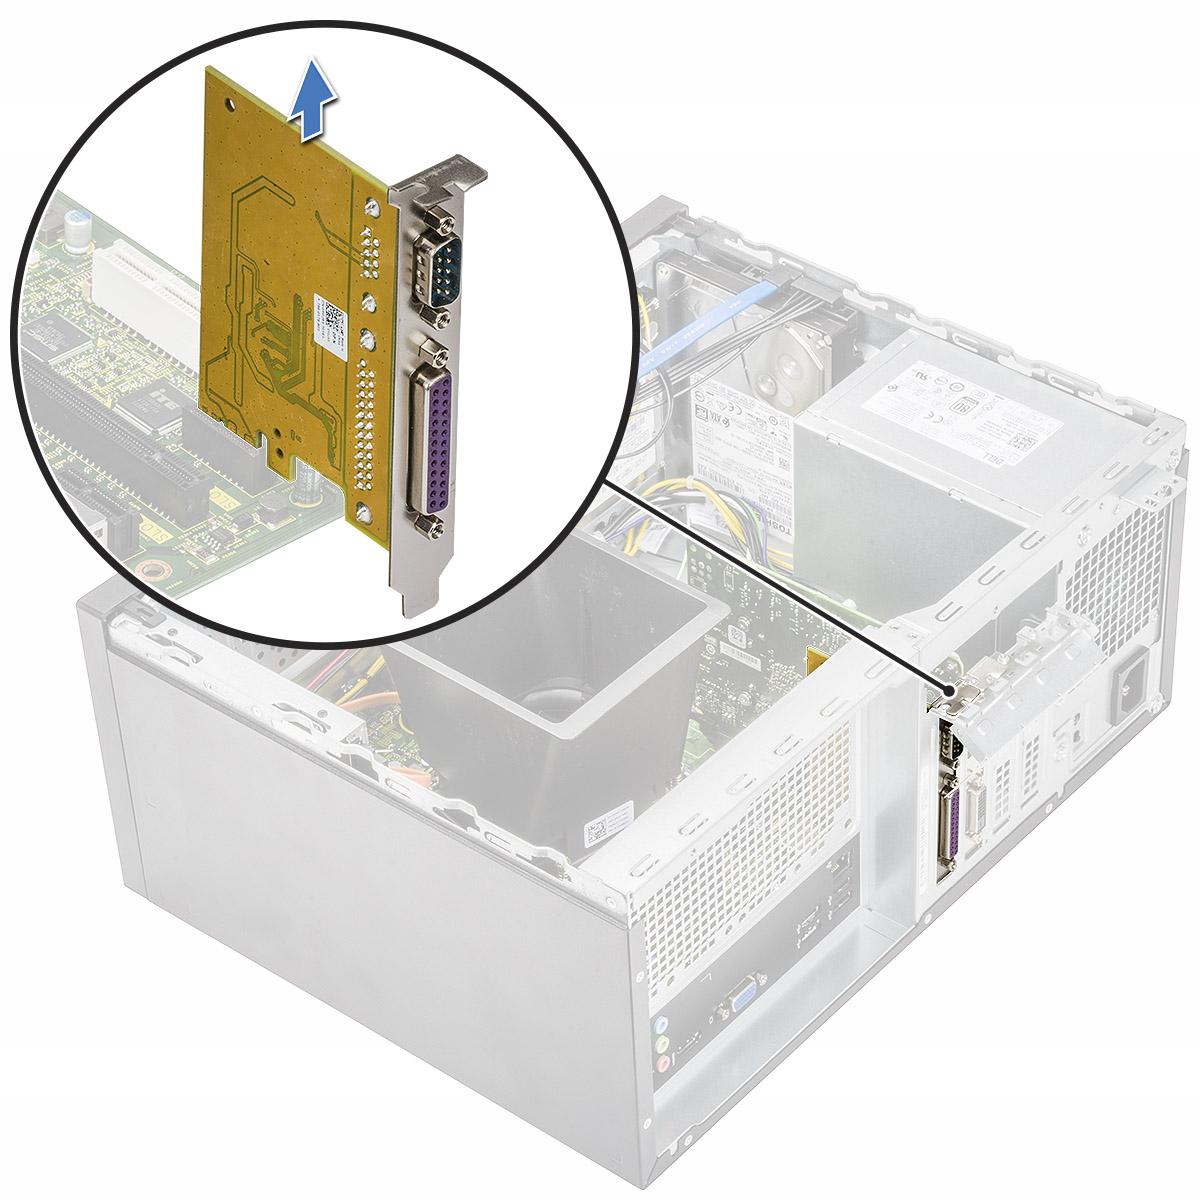 Løsne PCIe-kortet